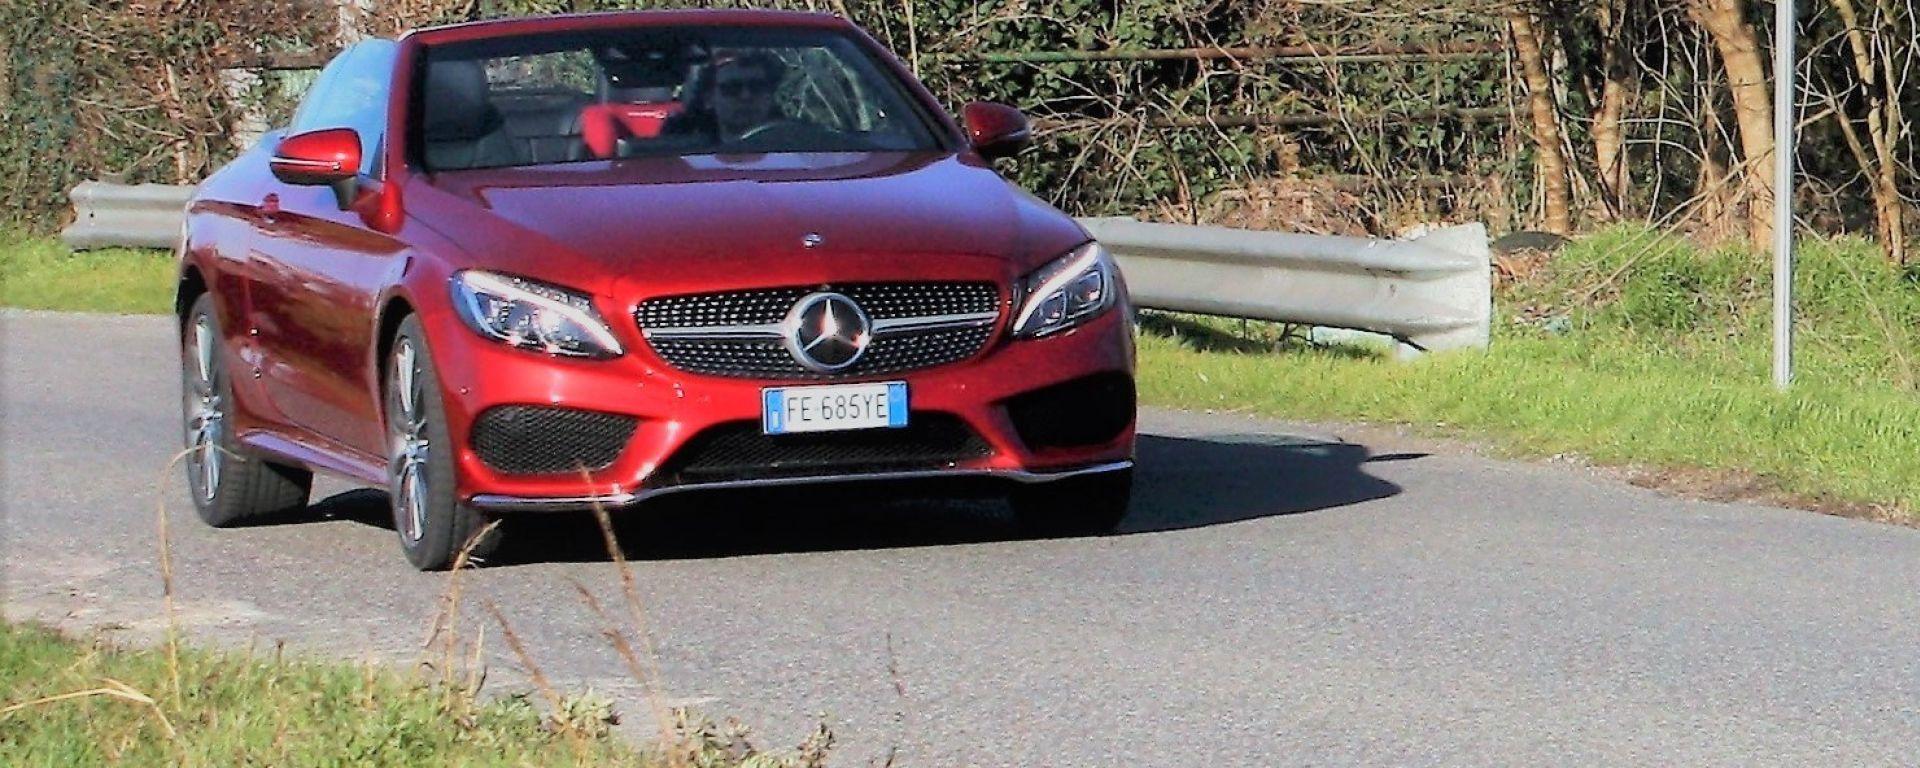 Mercedes C220d 4matic Cabrio Automatic Premium: test drive